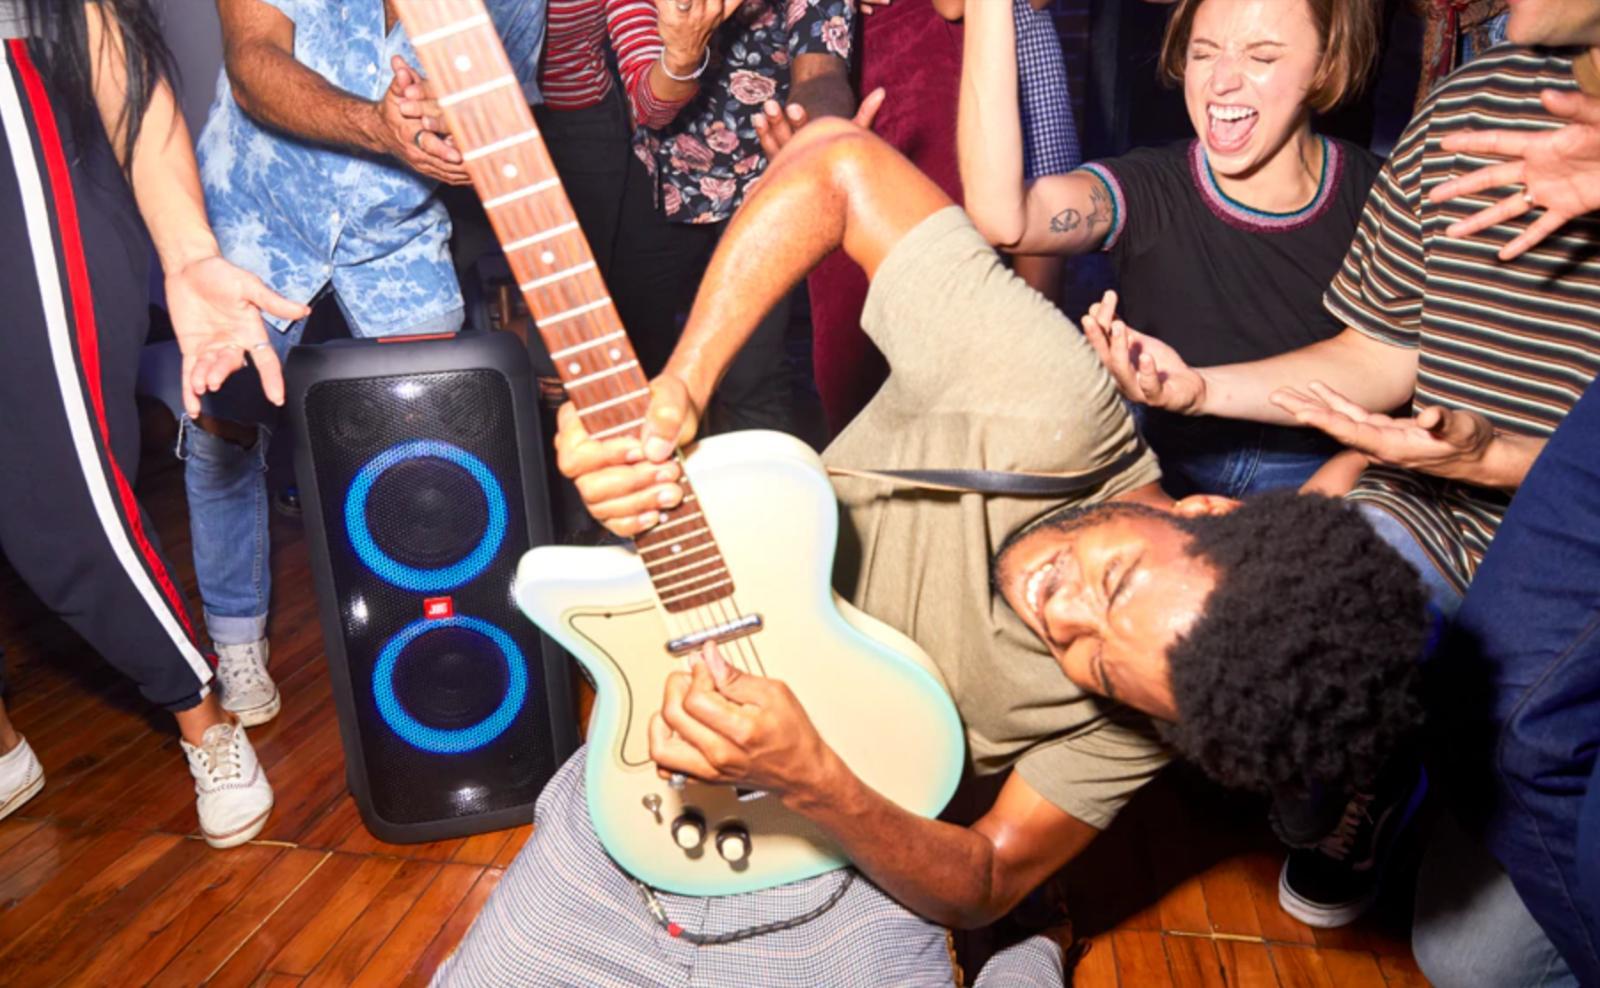 JBL Boombox Speaker Waterproof Outdoor Party Favors 24